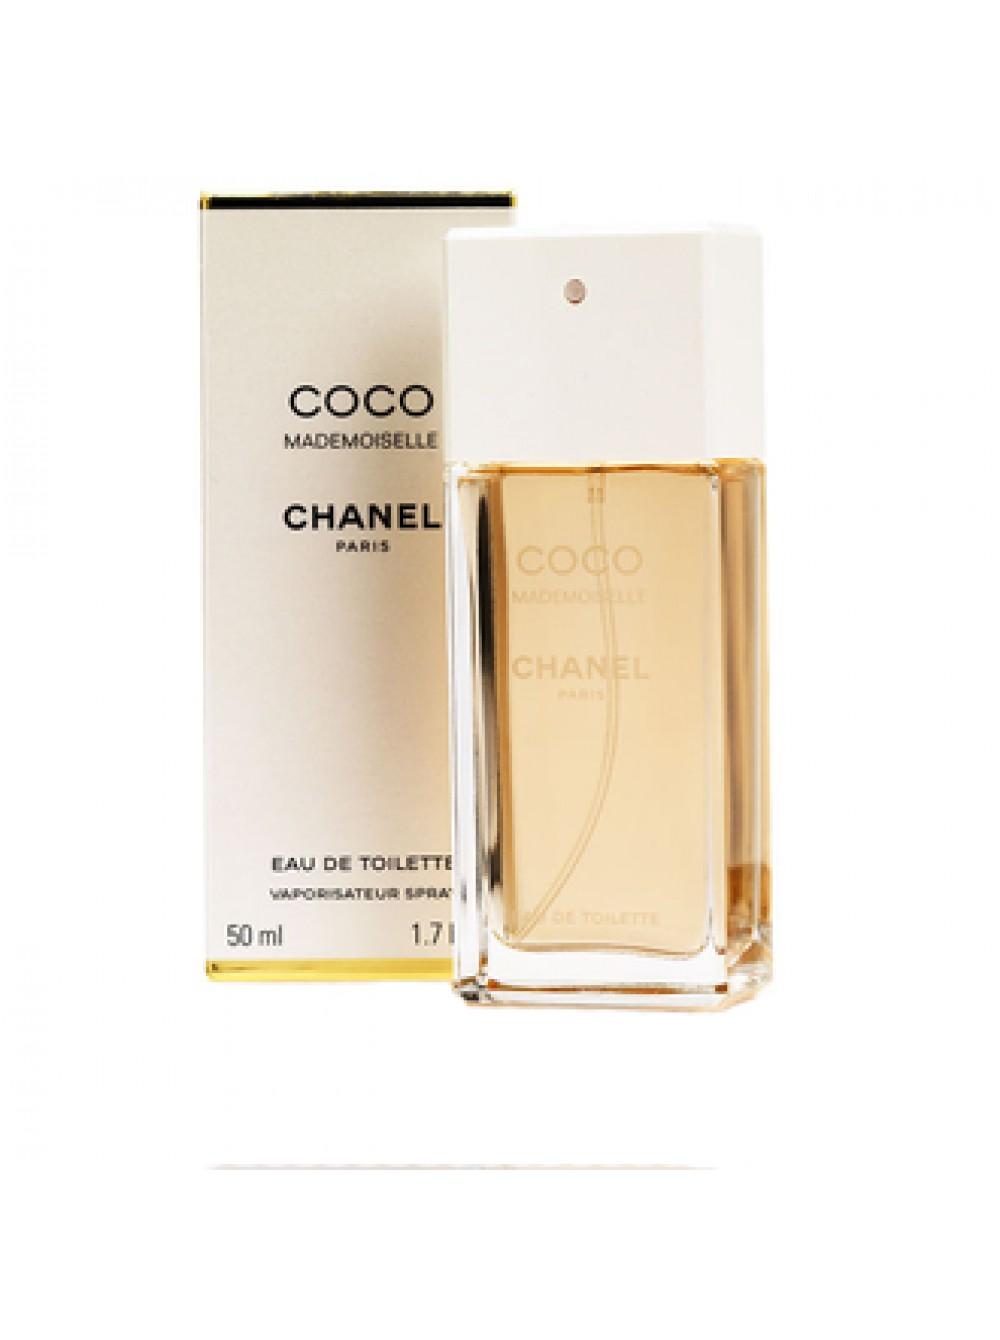 купить Chanel Coco Mademoiselle Eau De Toilette туалетная вода 50 мл